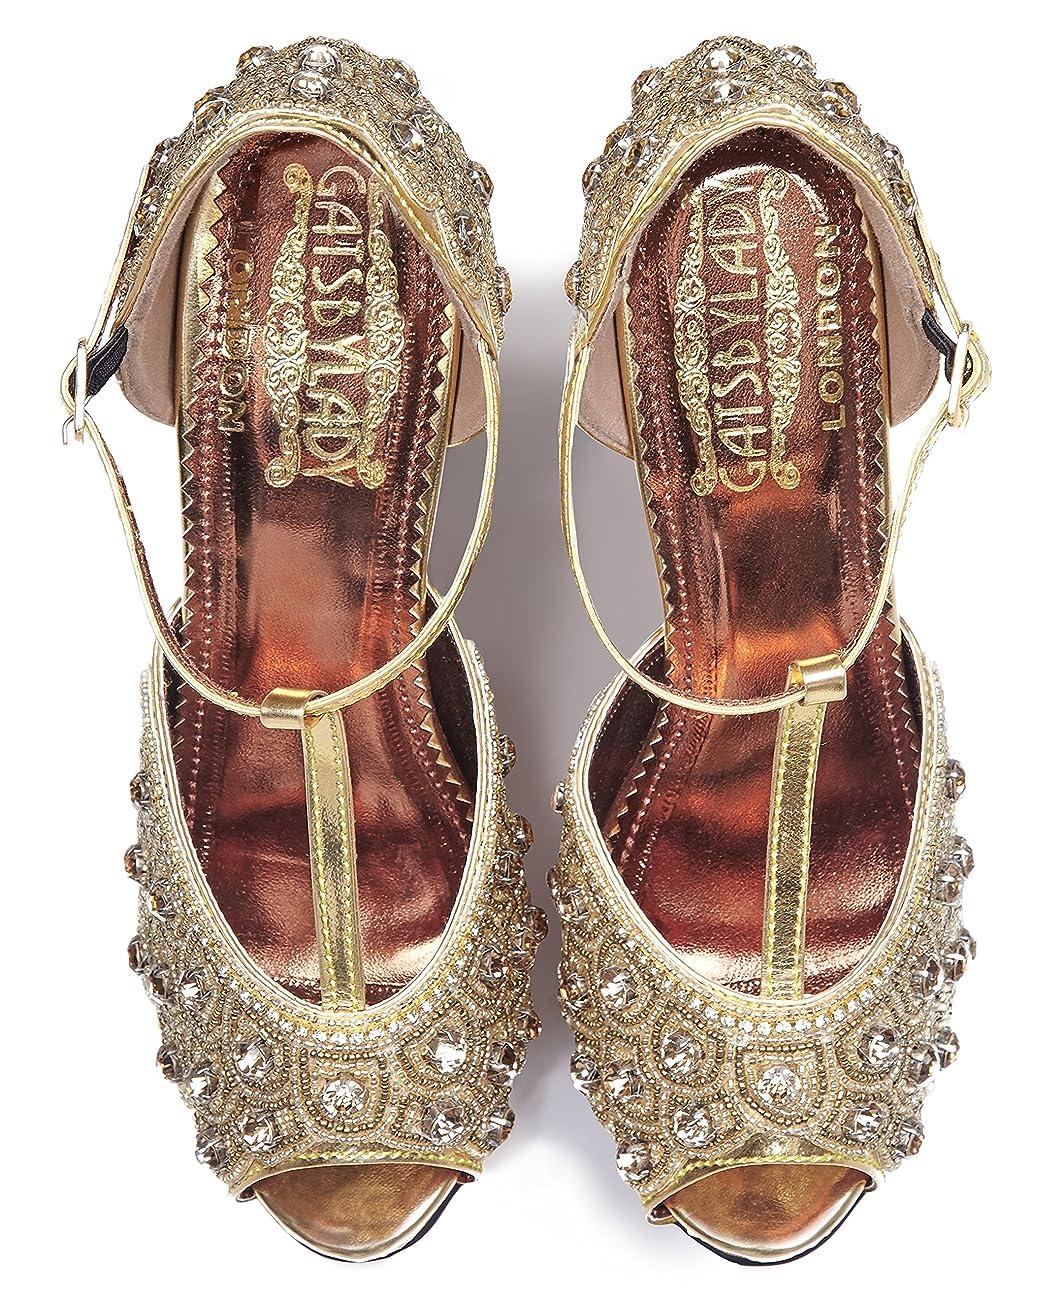 Donna Vintage Inspired T-Strap Heels in Gold 1